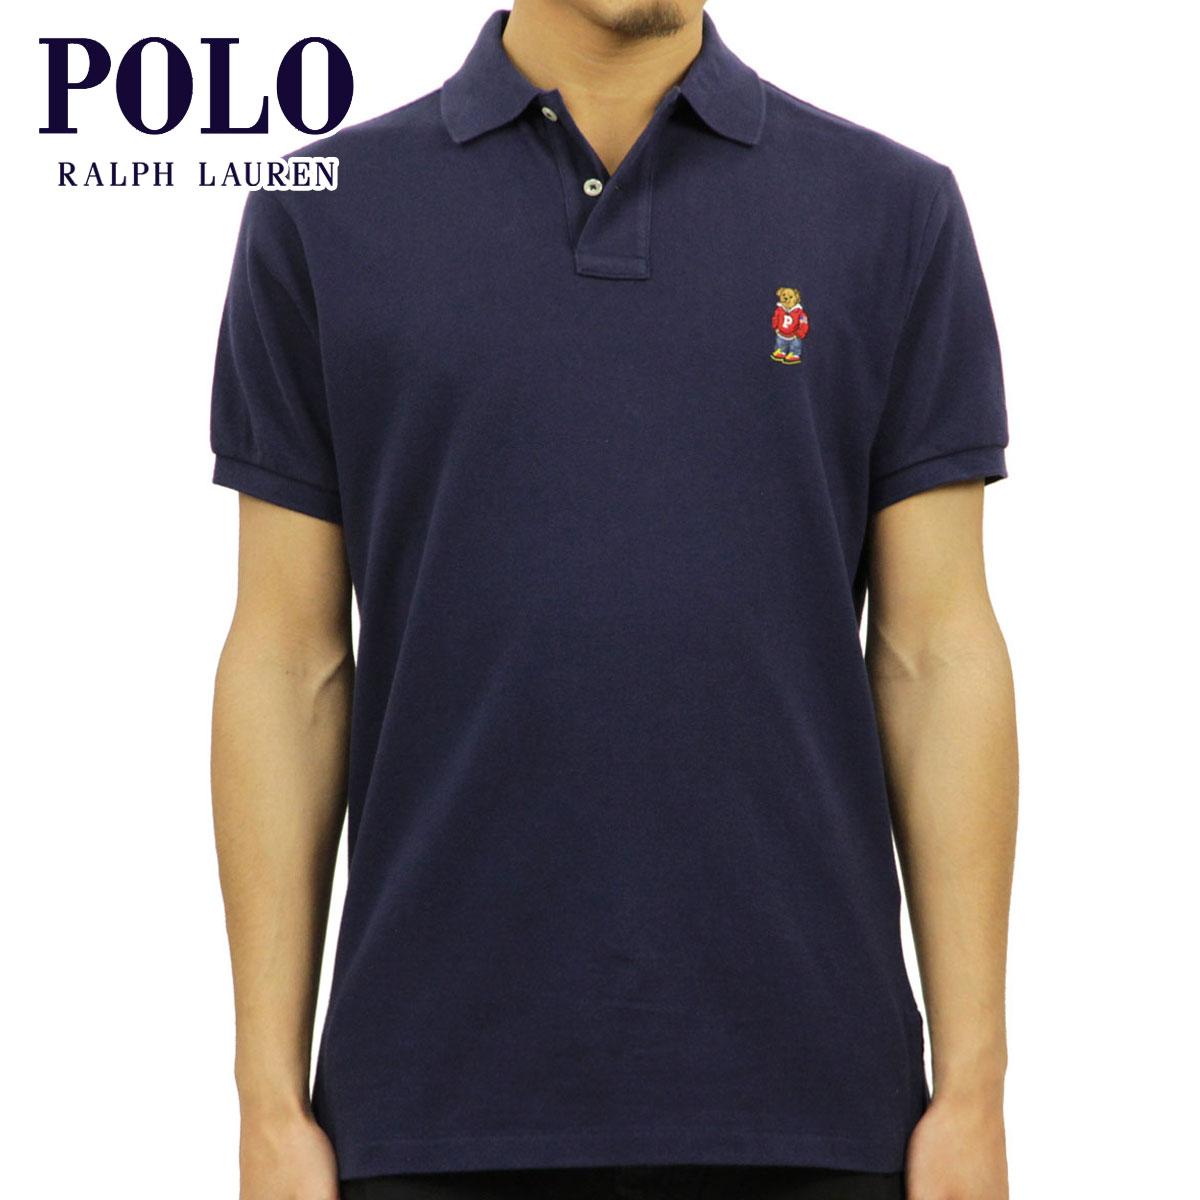 e2297a44 Polo Ralph Lauren POLO RALPH LAUREN regular article men custom fitting  short sleeves polo shirt POLO ...